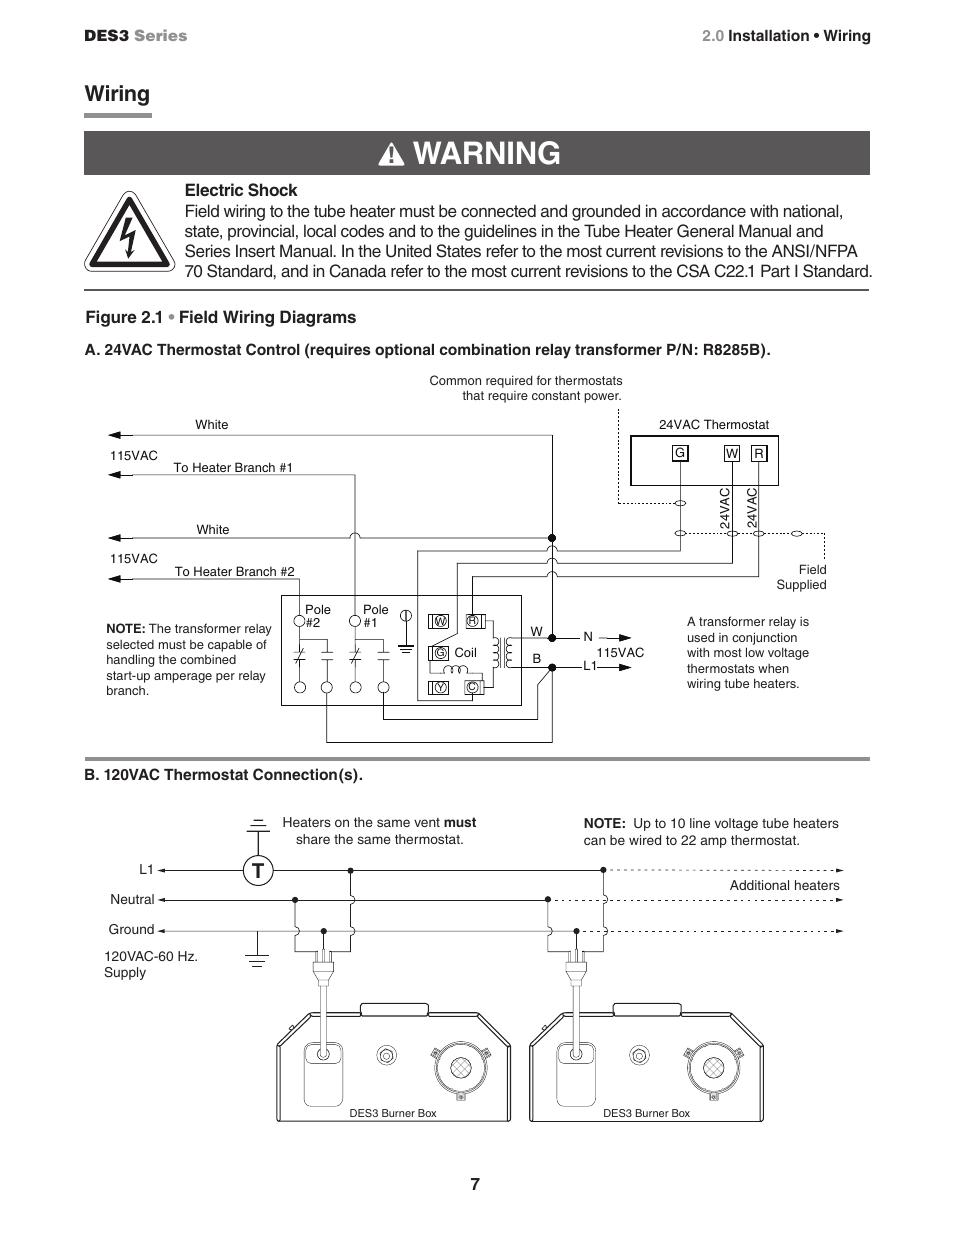 Tube Heaters Wiring Diagram Schematic Diagrams Radiant Heater Warning Figure 2 1 U2022 Field Detroit Water 240v